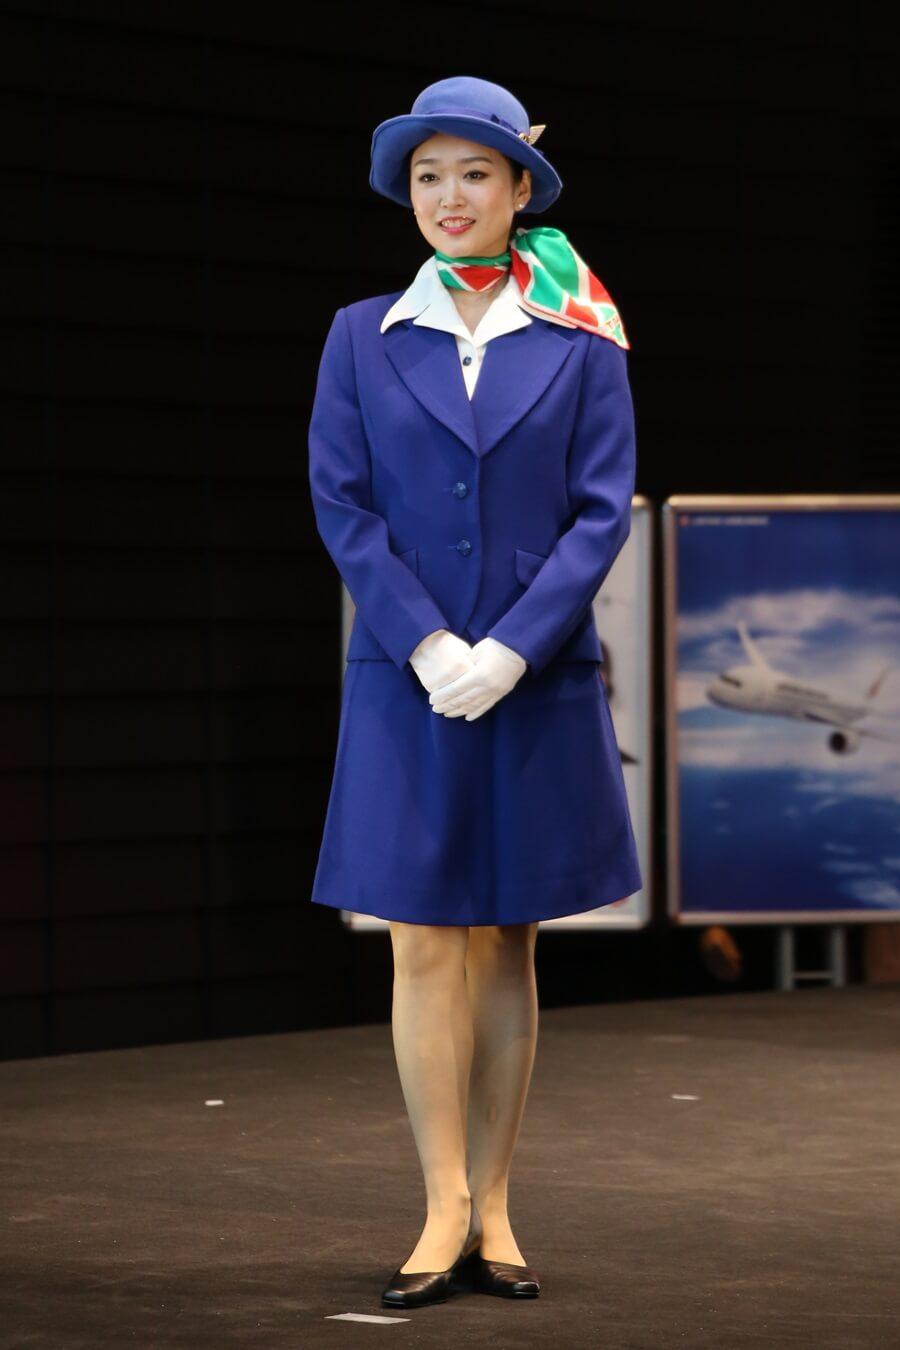 JAS3代目制服 JALとJEX客室乗務員歴代制服ファッションショー 客室乗務員 スチワーデス 歴代ユニフォーム 制服 空の日フェスティバル JAL fashion show JAS (2)